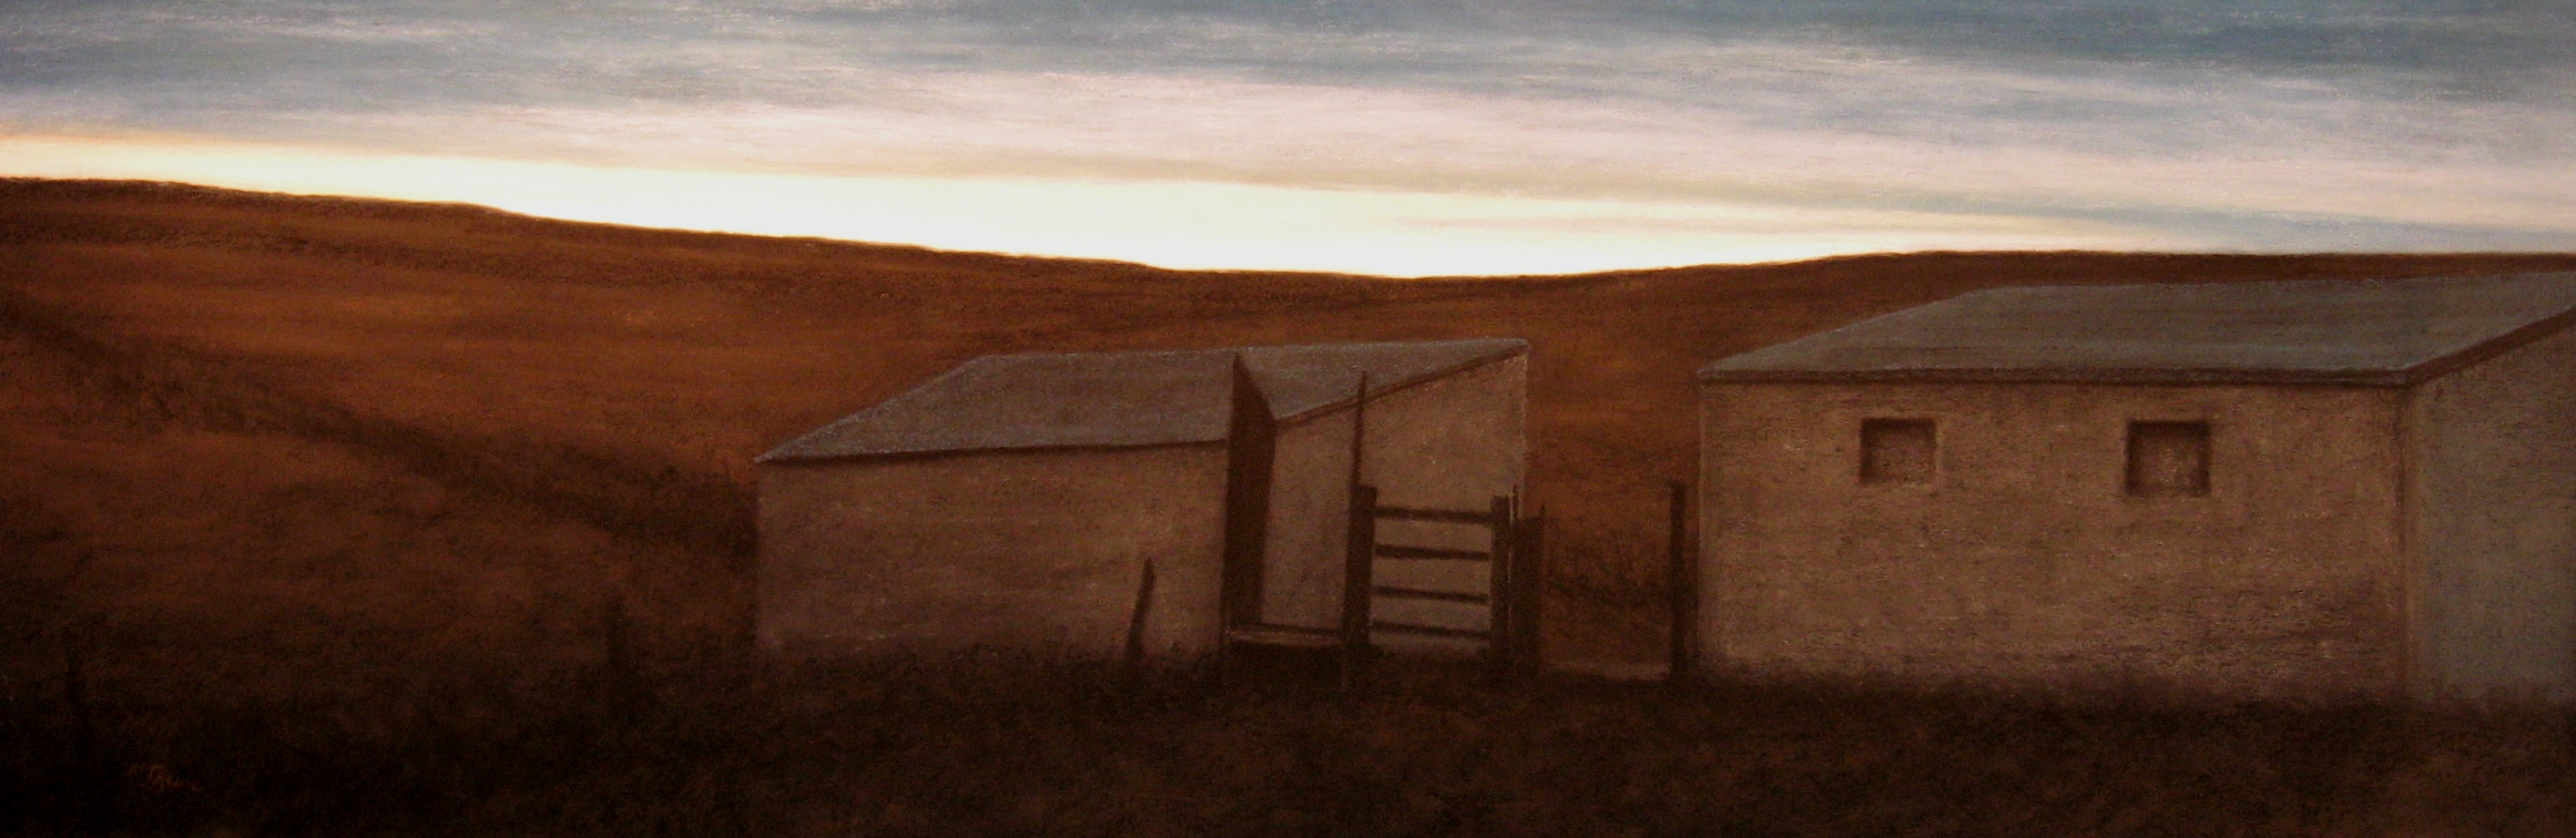 Dawn, 16x48, 2008